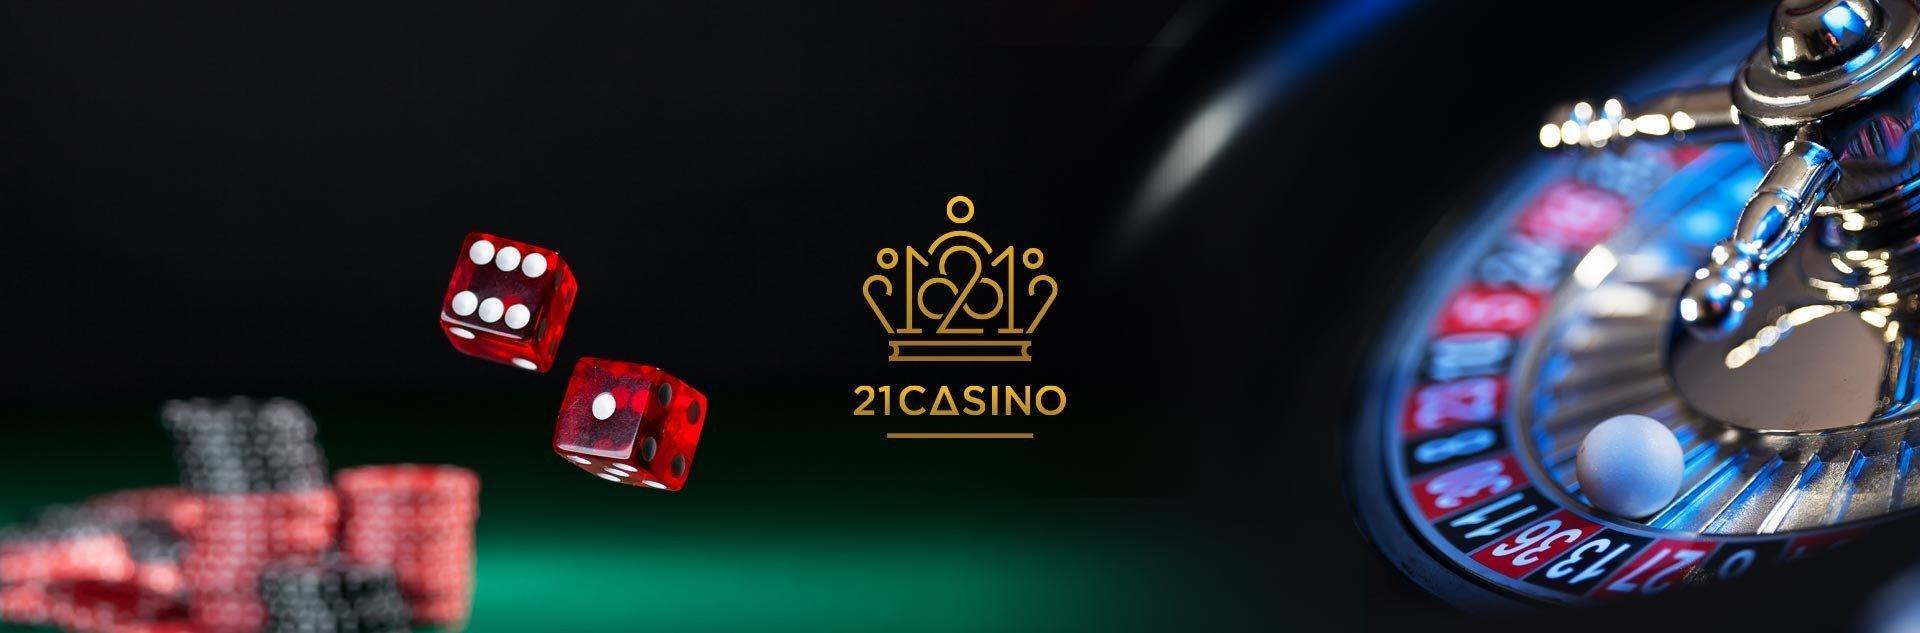 21 Casino review UK